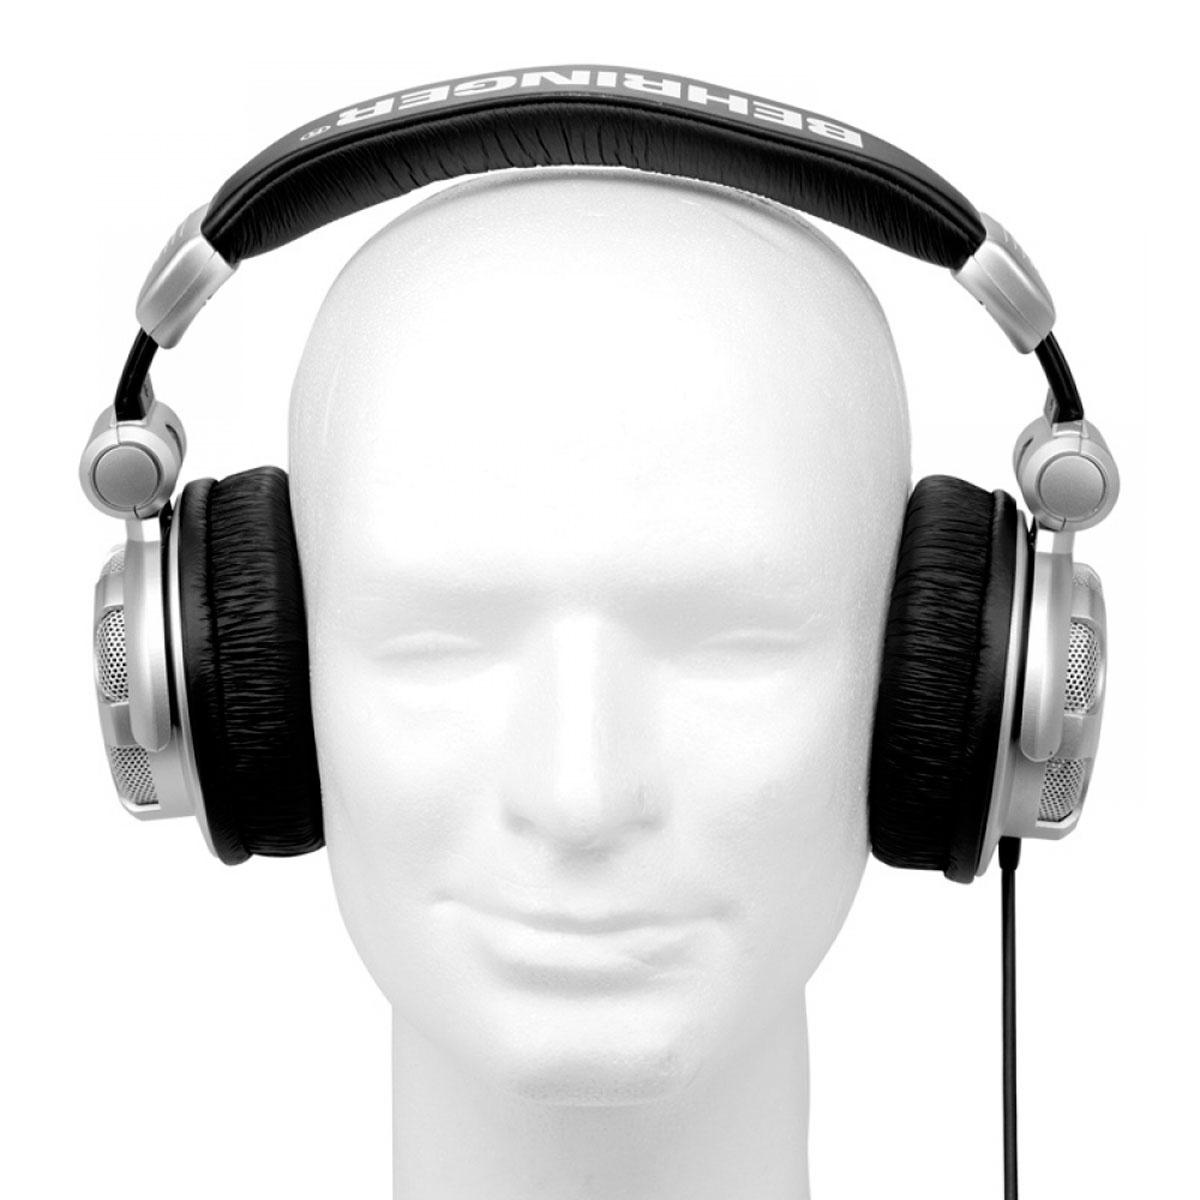 Fone de Ouvido Over-ear 20Hz - 20KHz 64 Ohms - HPX 2000 Behringer